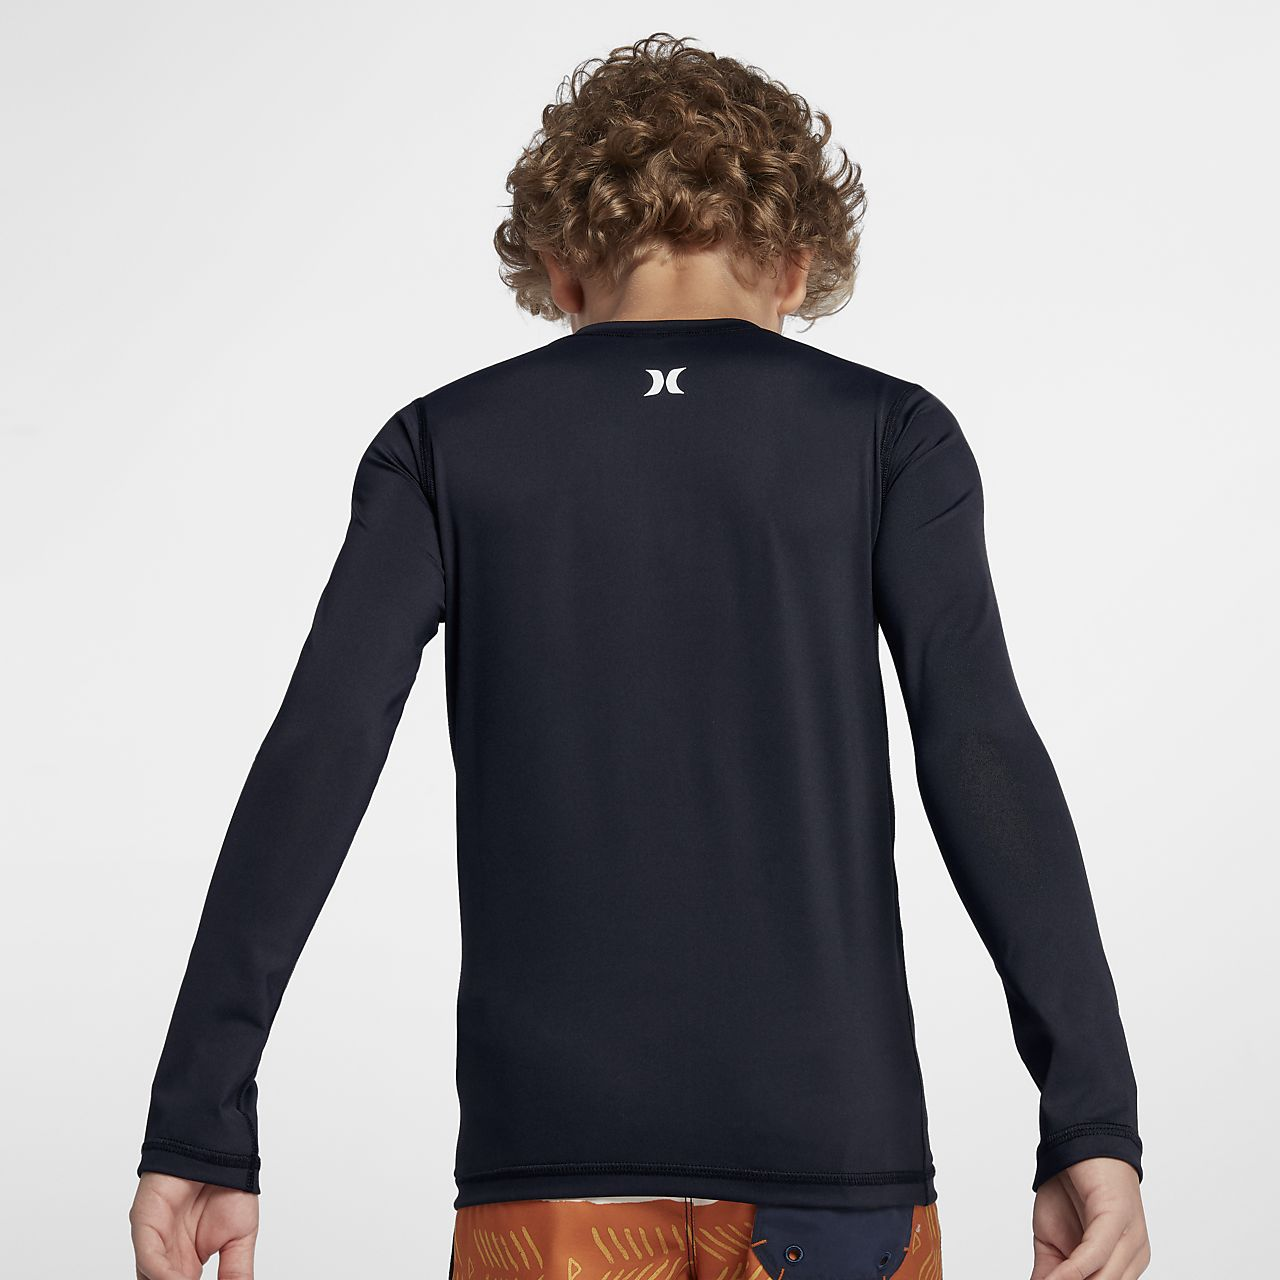 8c9aed0451 ... Camiseta protectora de manga larga para niño Hurley One And Only